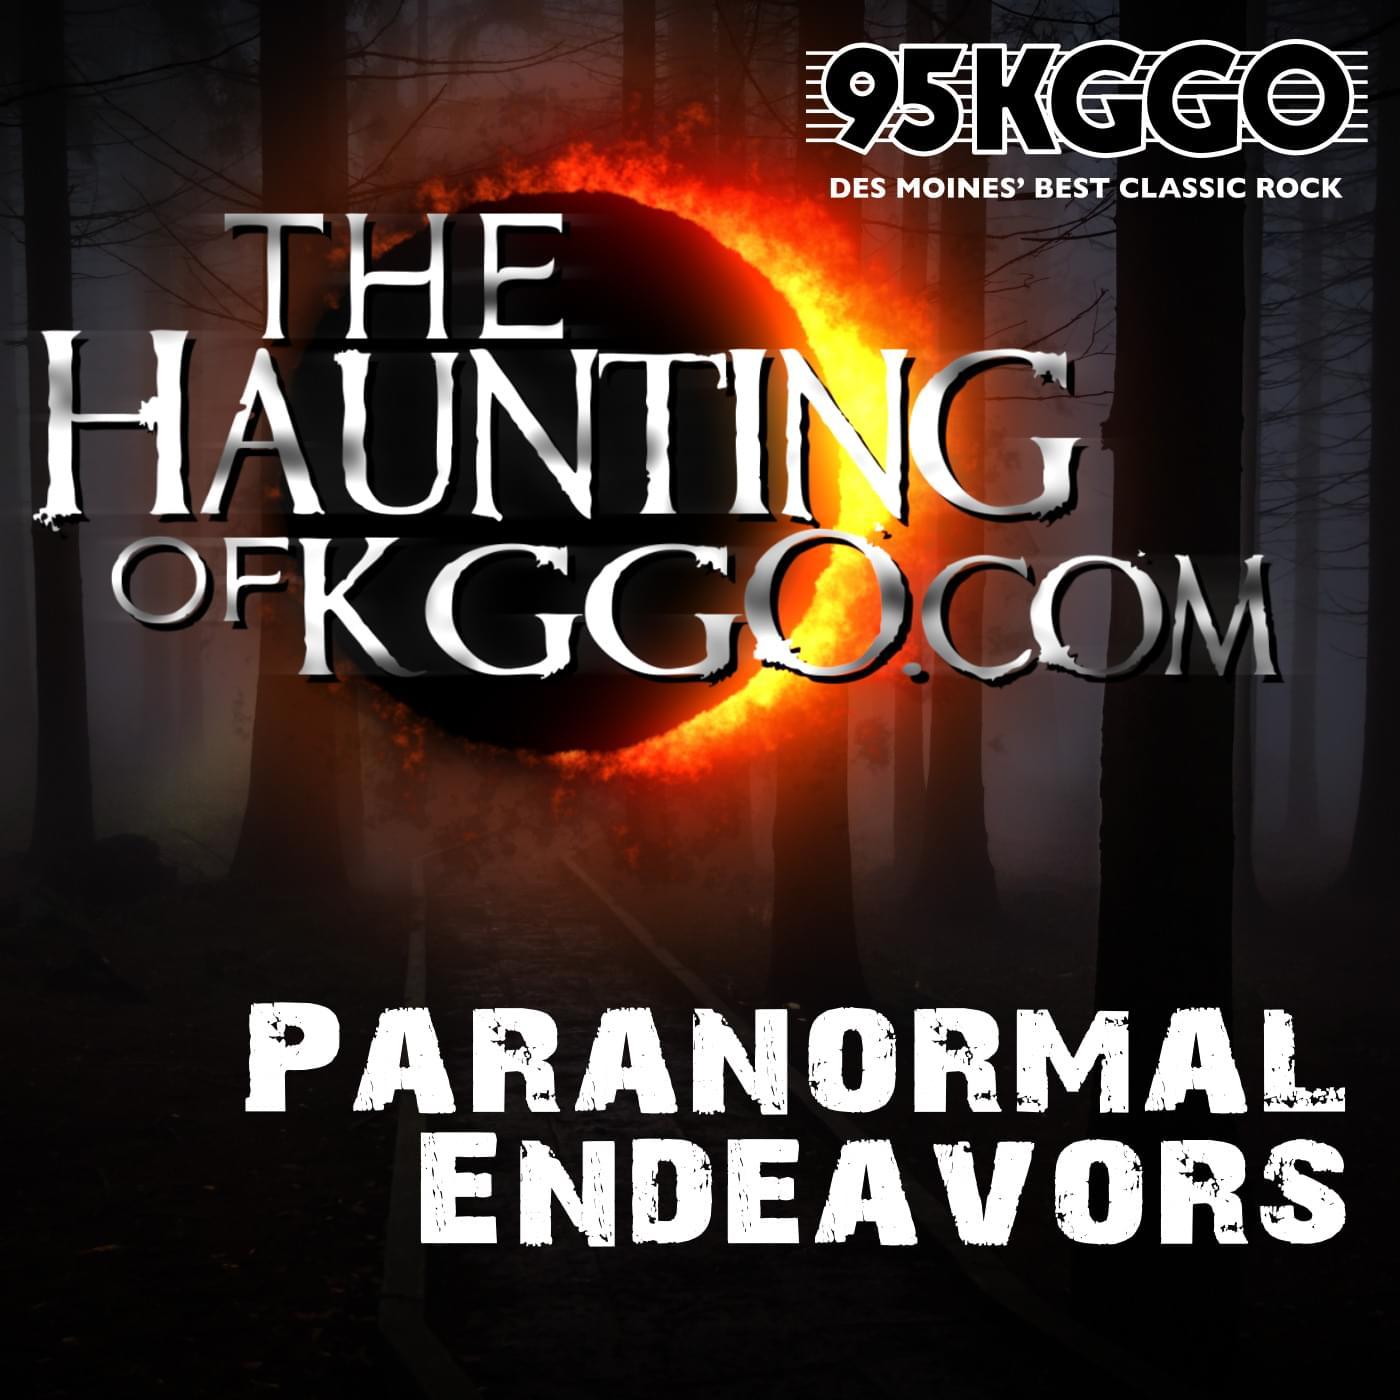 Haunting of KGGO.com – Paranormal Endeavors